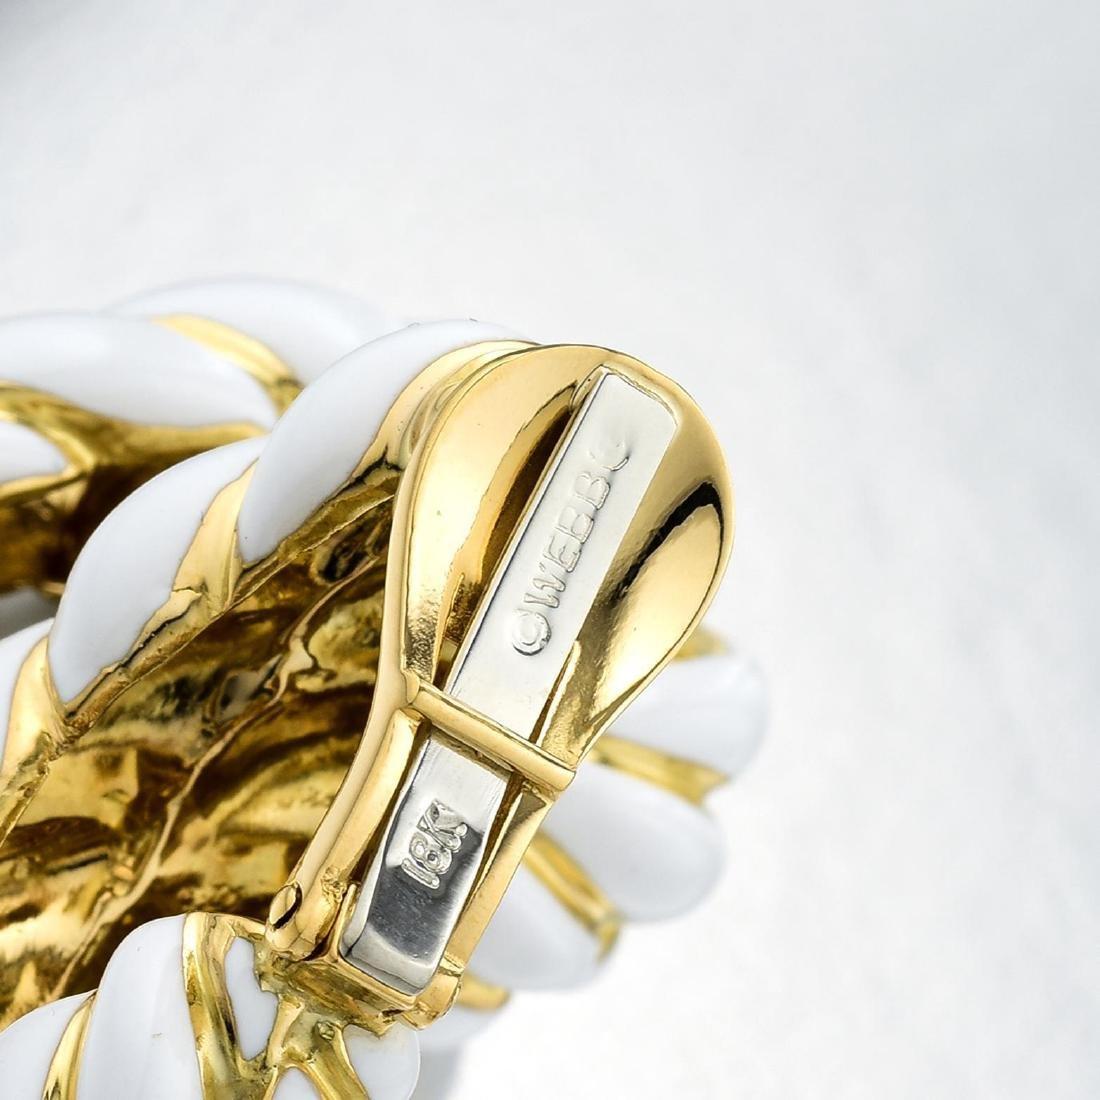 David Webb Gold and Enamel Ear Clips - 3